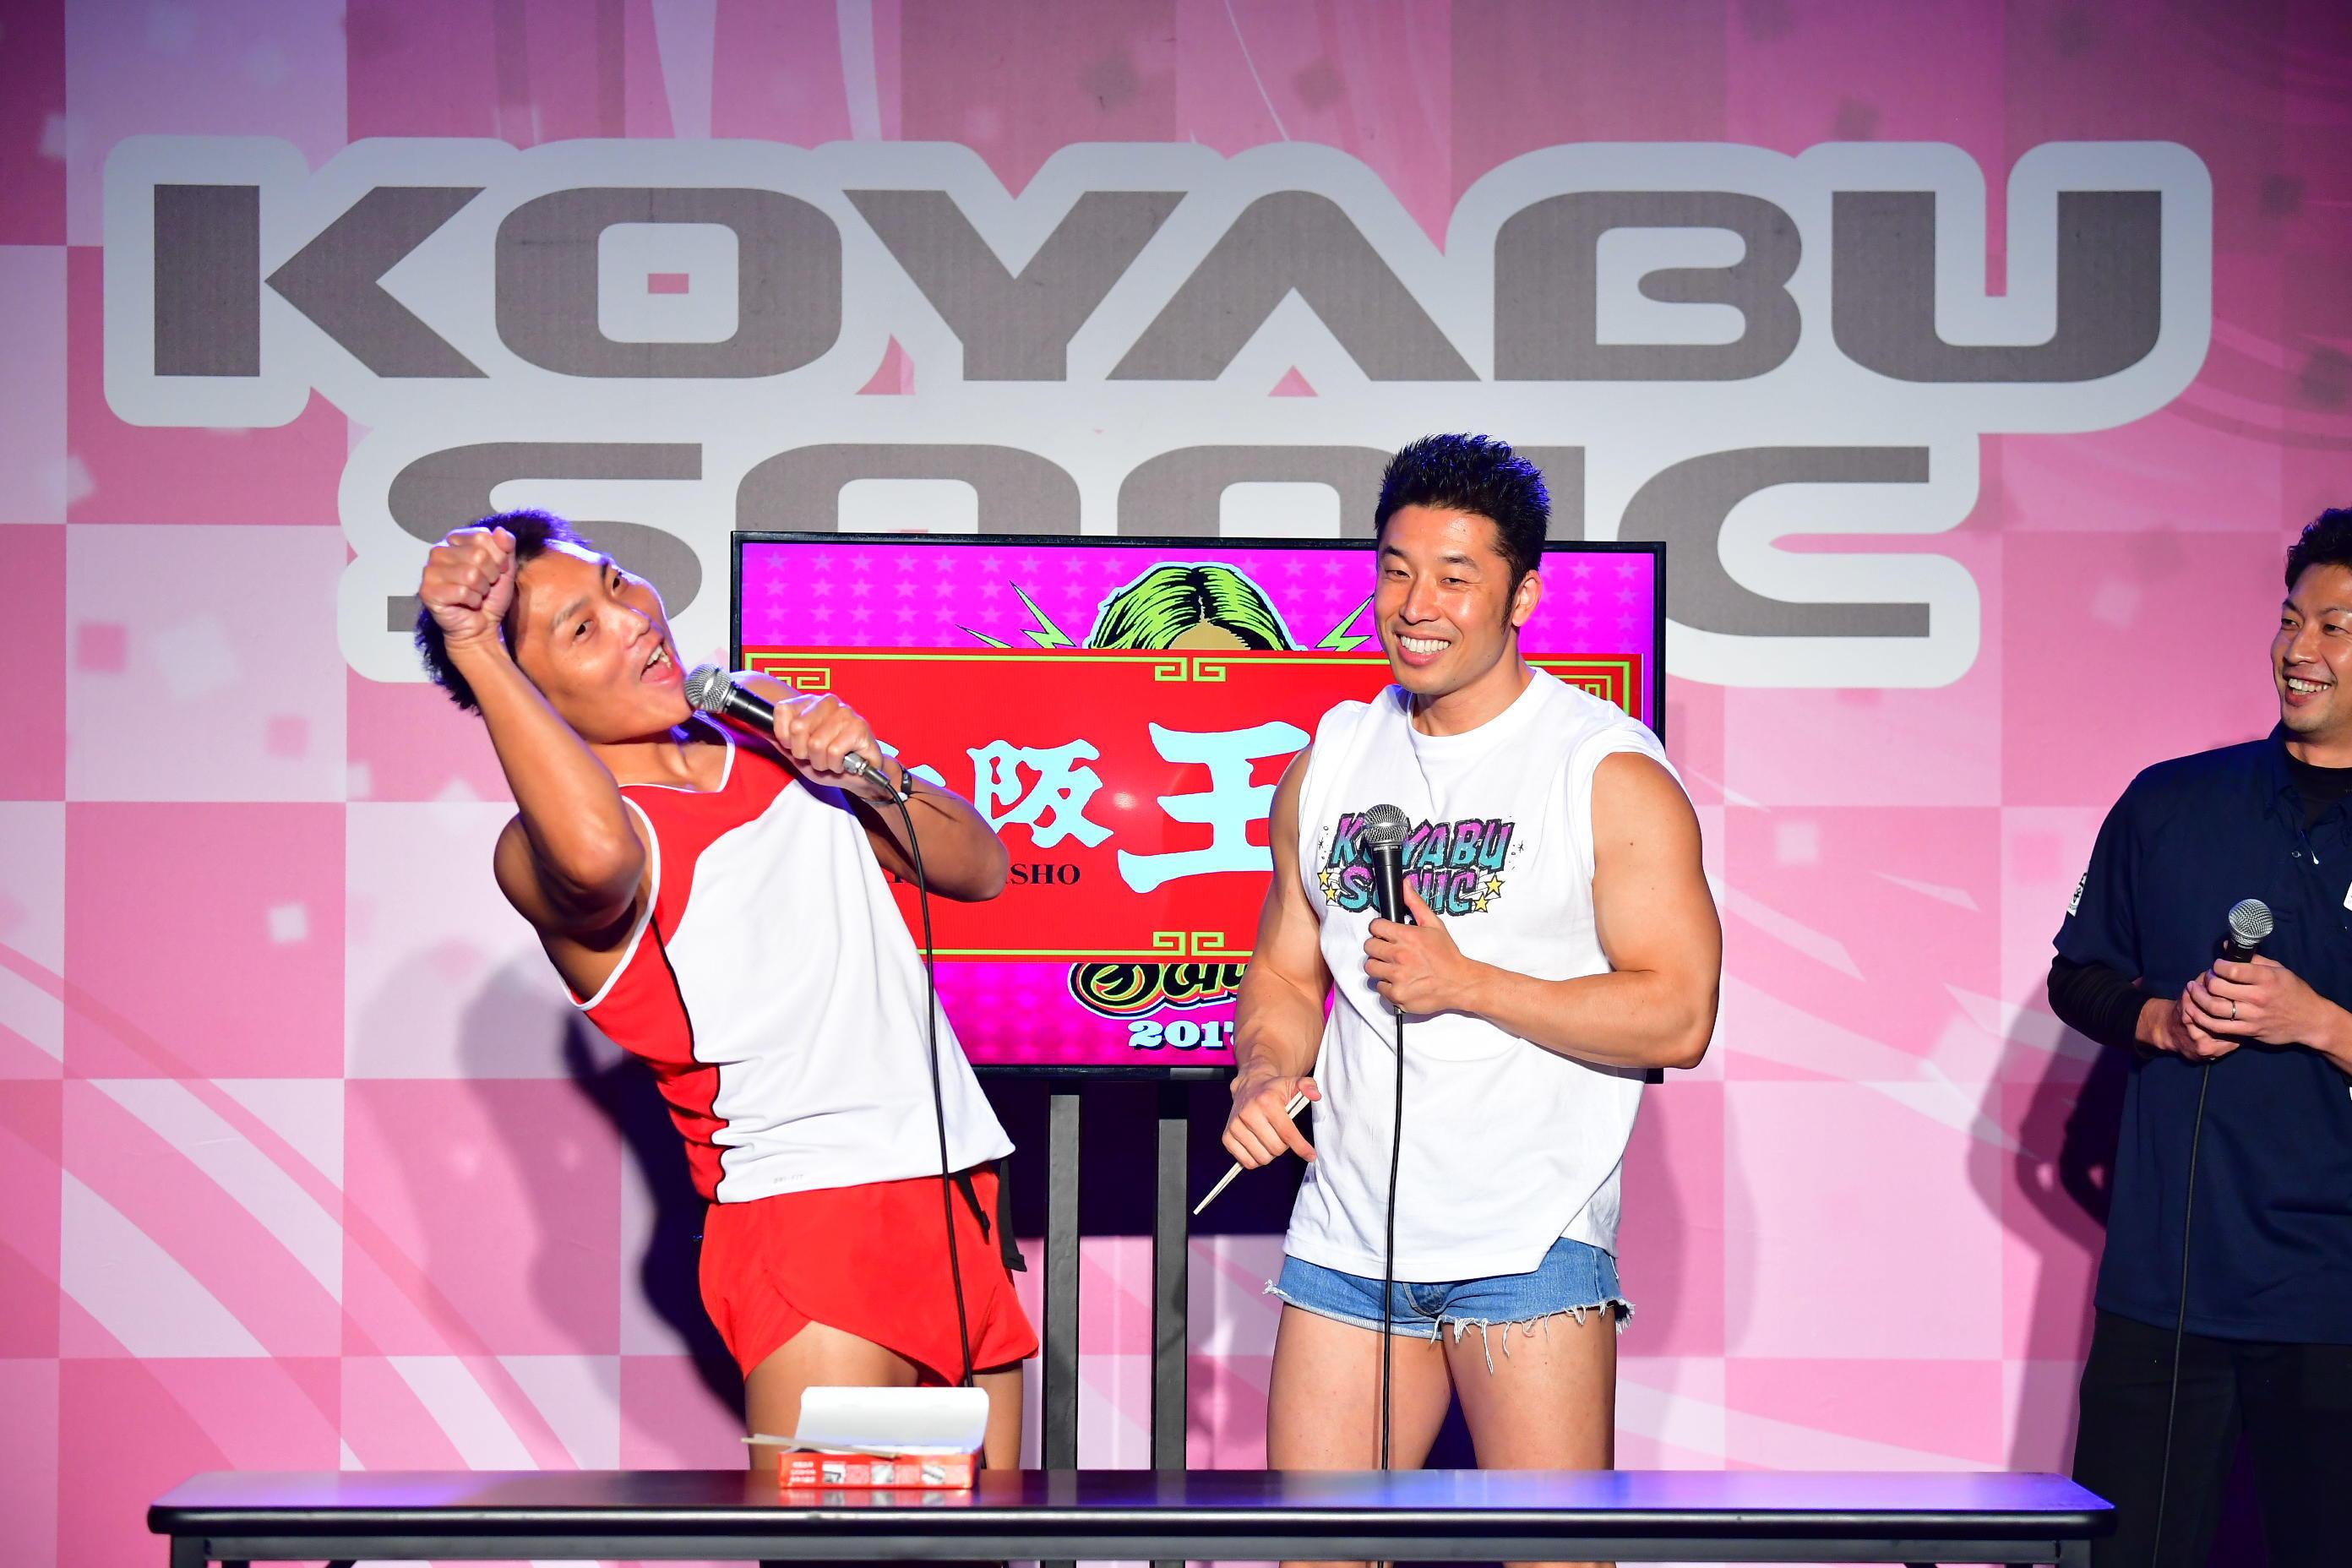 http://news.yoshimoto.co.jp/20171106134459-d9aad9b0d9876f94638b01d5a6bf3a9d30dad855.jpg